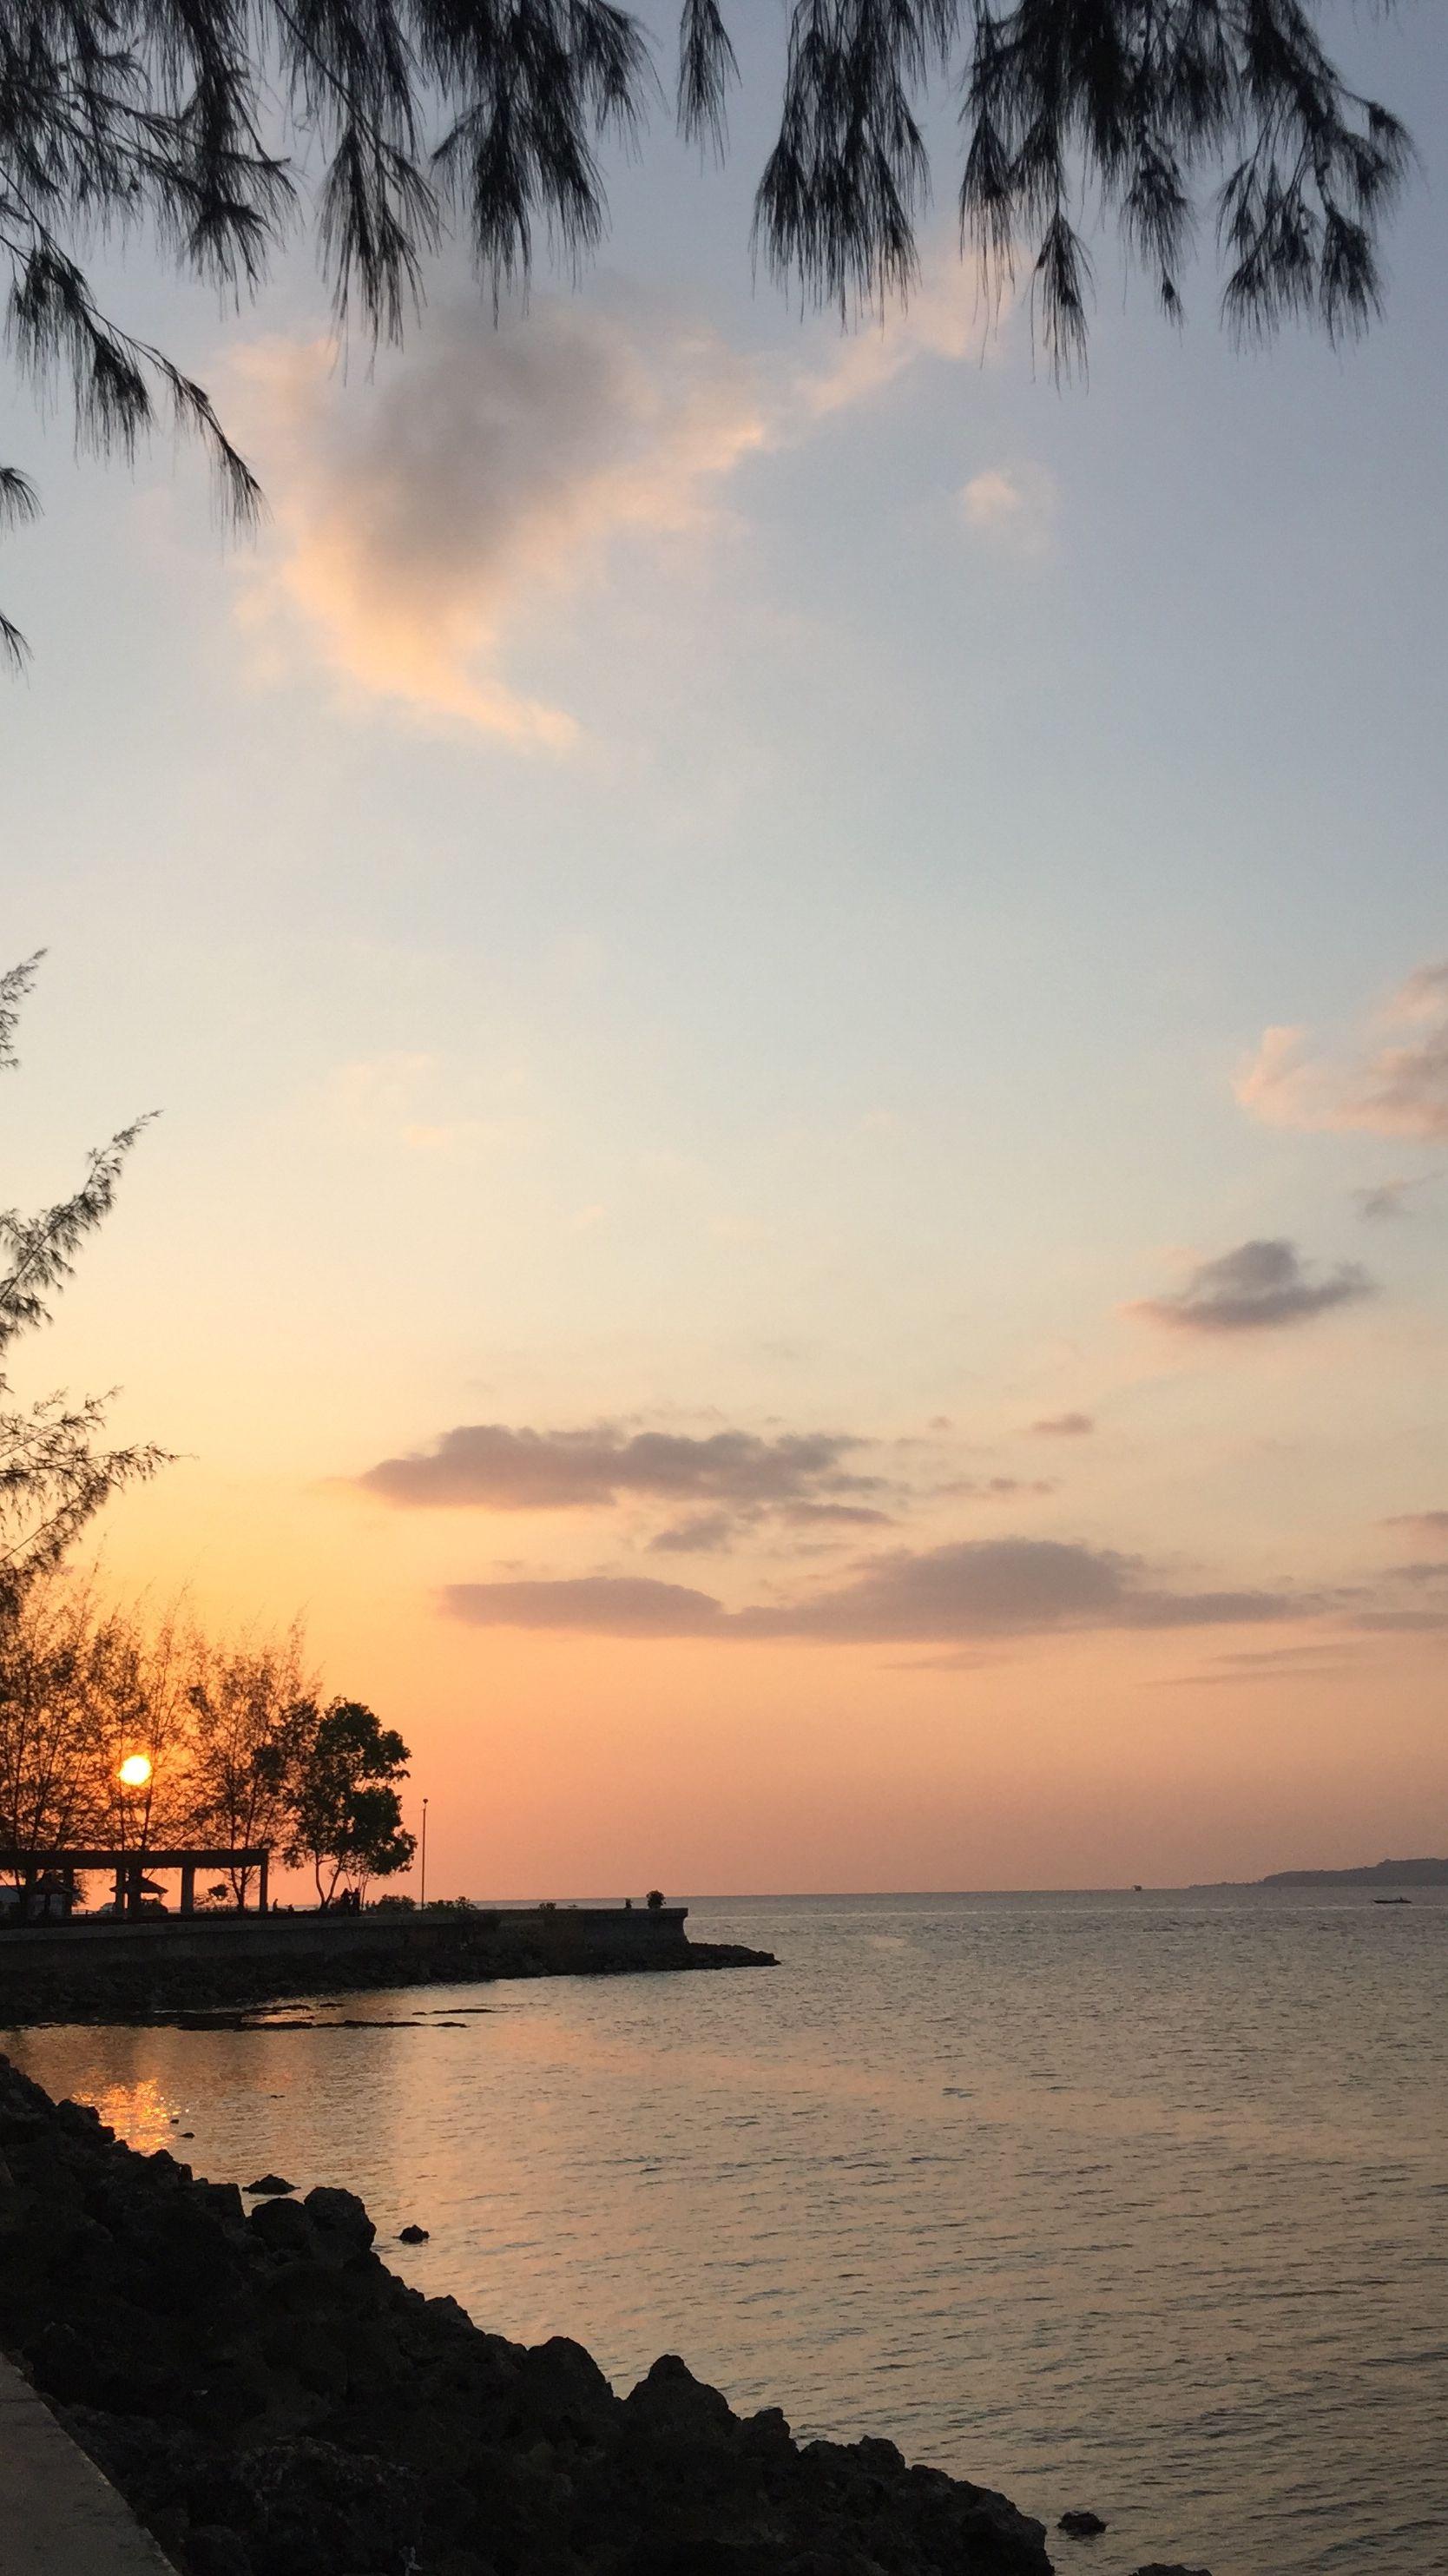 #langit senja #senja from Uploaded by user